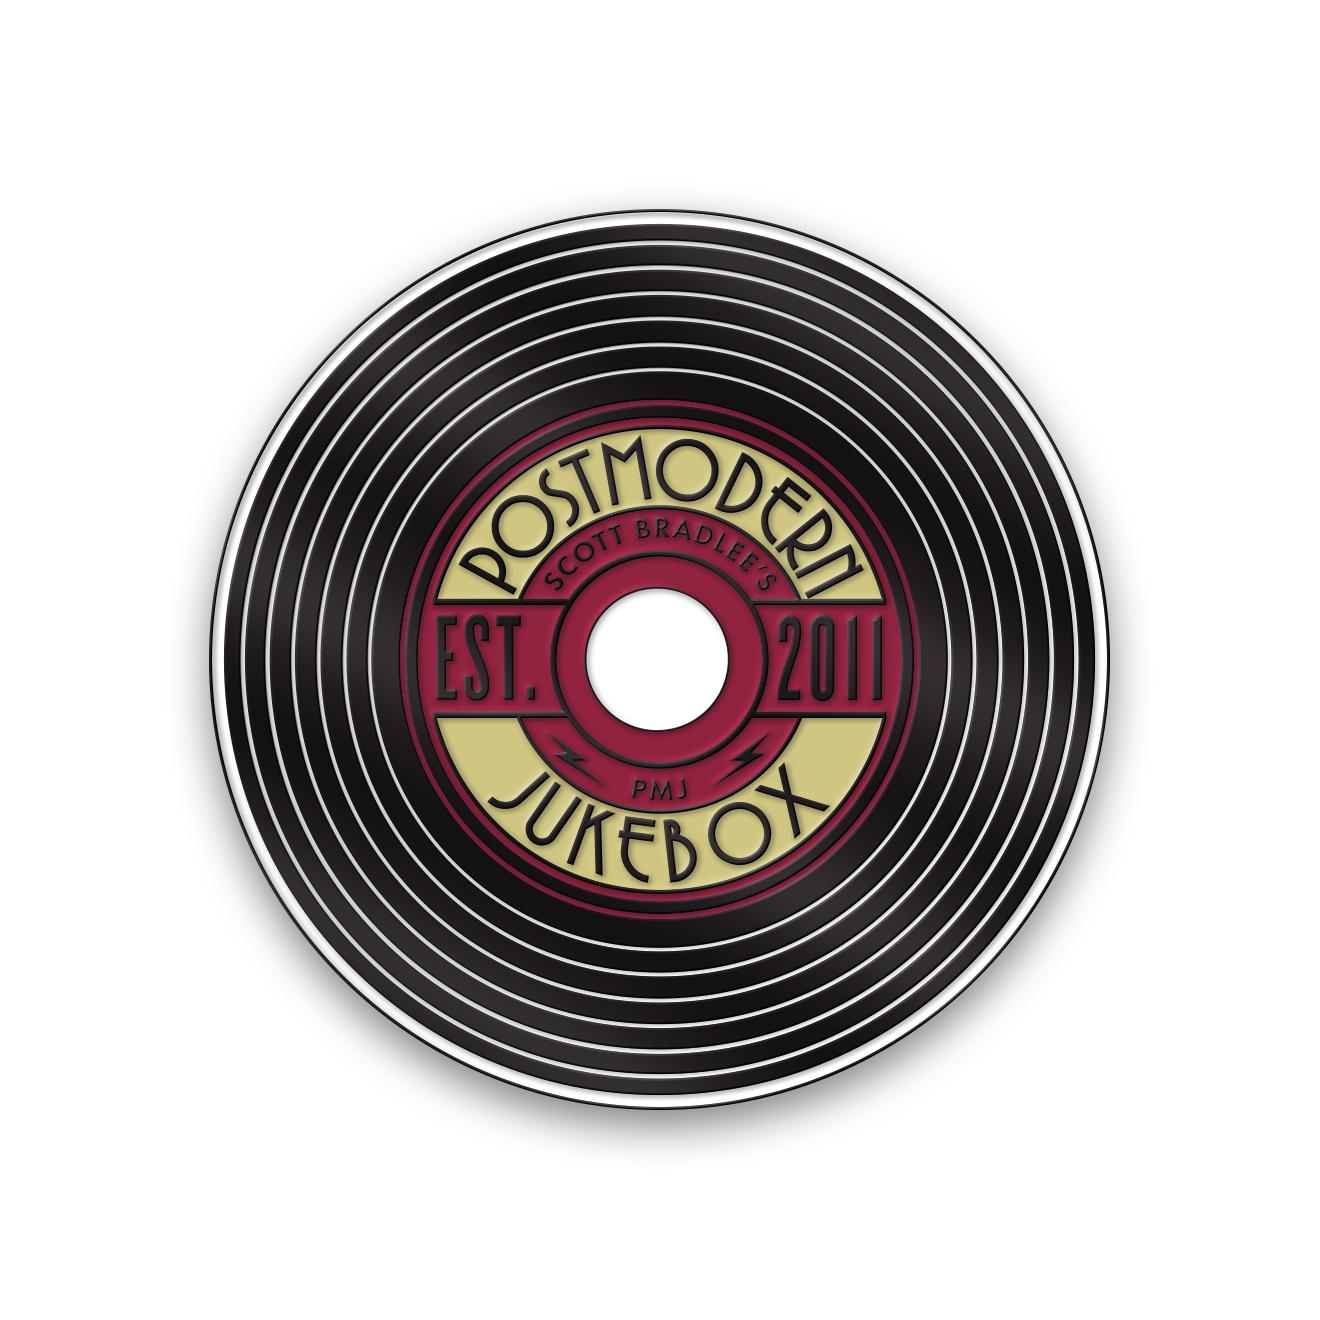 Postmodern Record Pin Enamel